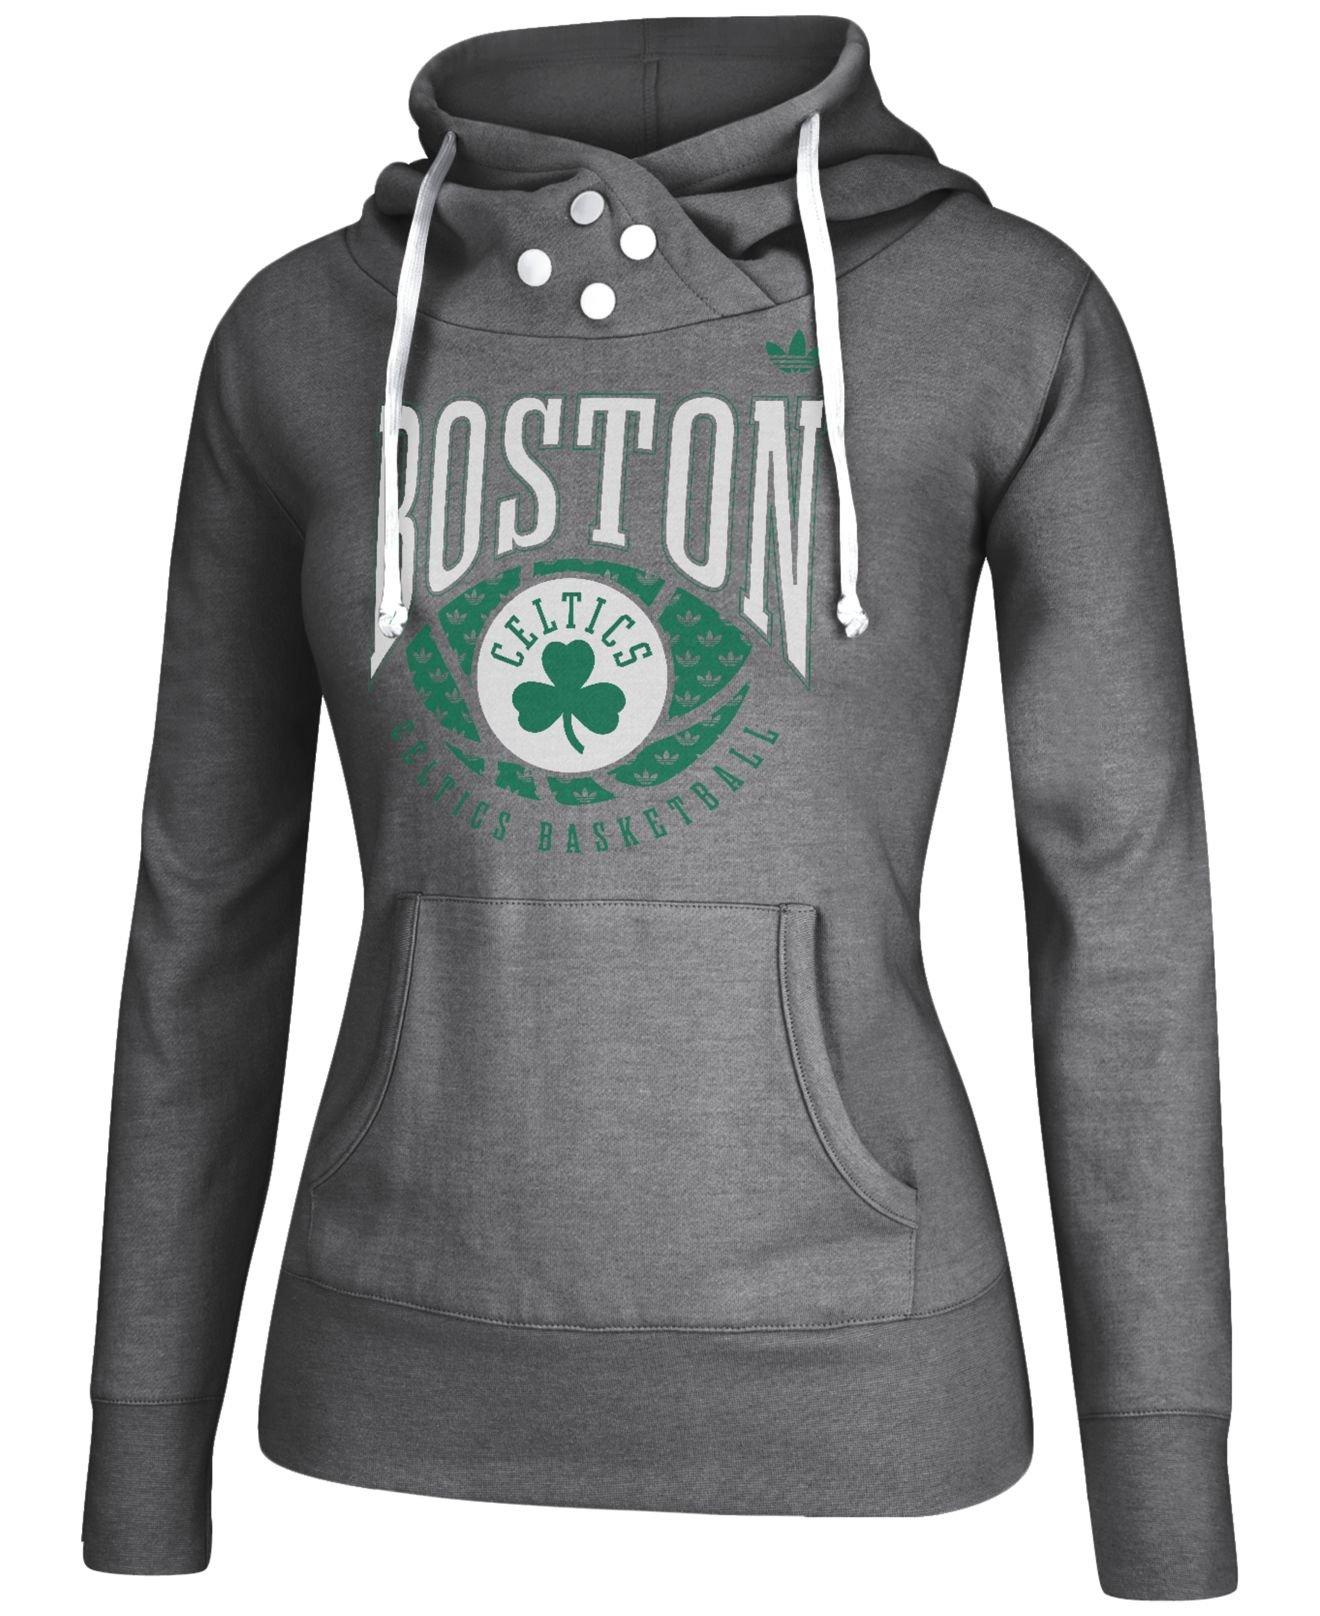 quality design dd7fb 76a36 Gray Women'S Boston Celtics Ballin Hoodie